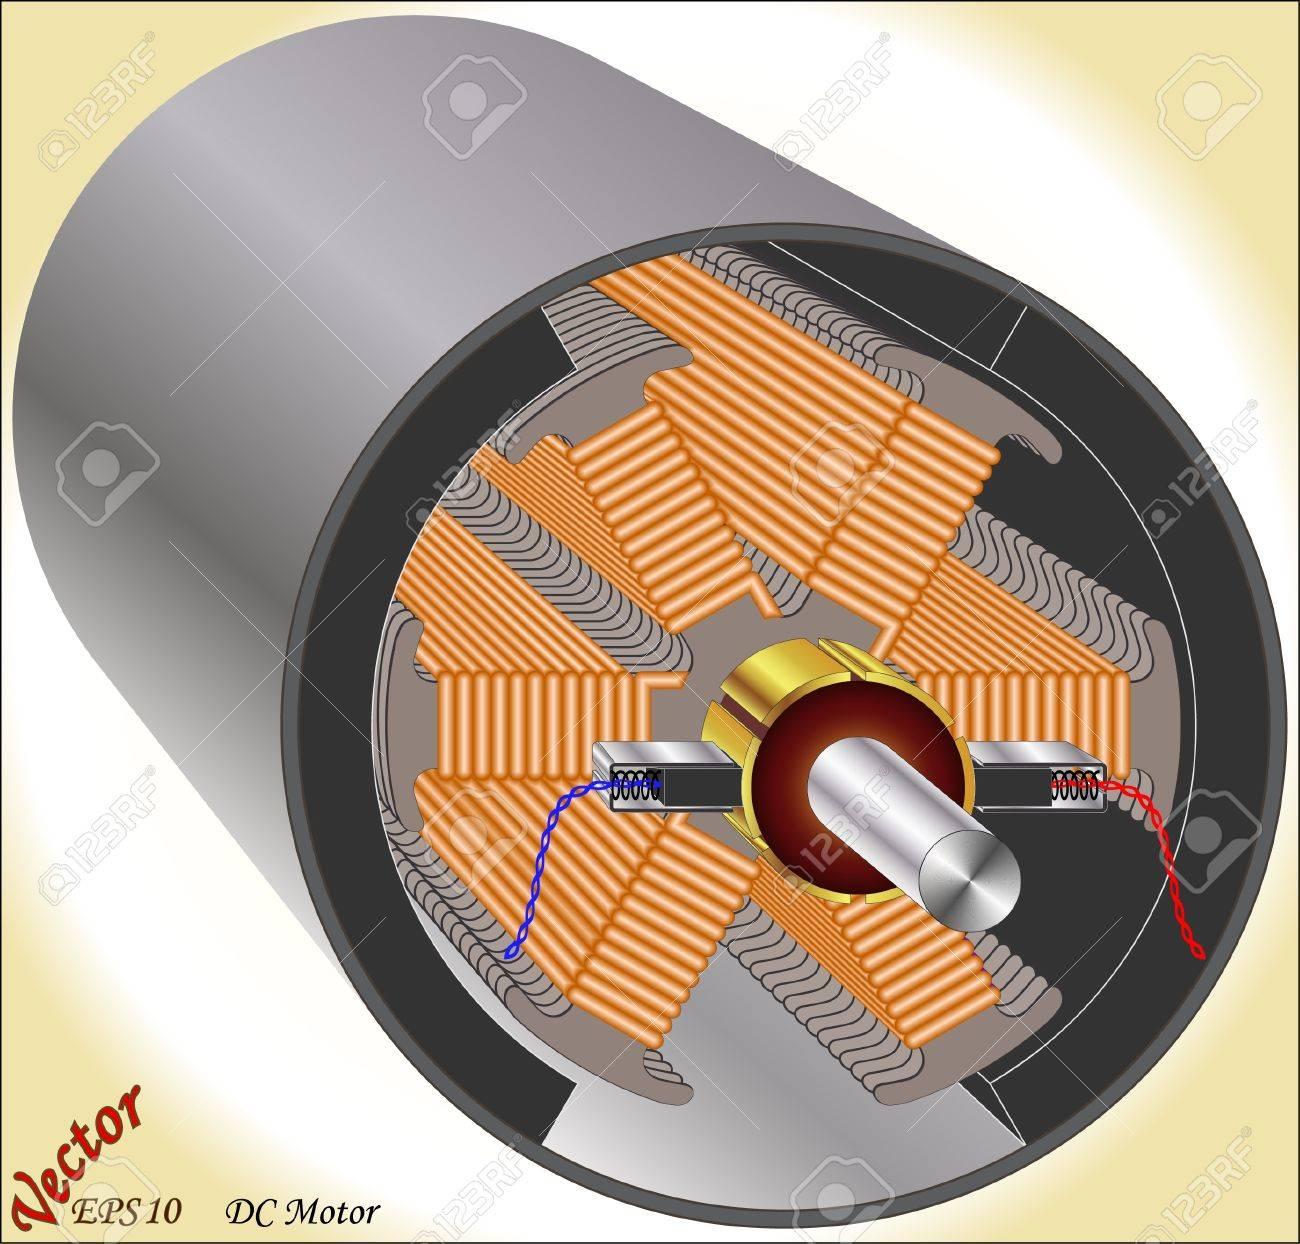 dc motor 6 poles royalty cliparts vectors and stock dc motor 6 poles stock vector 18702692